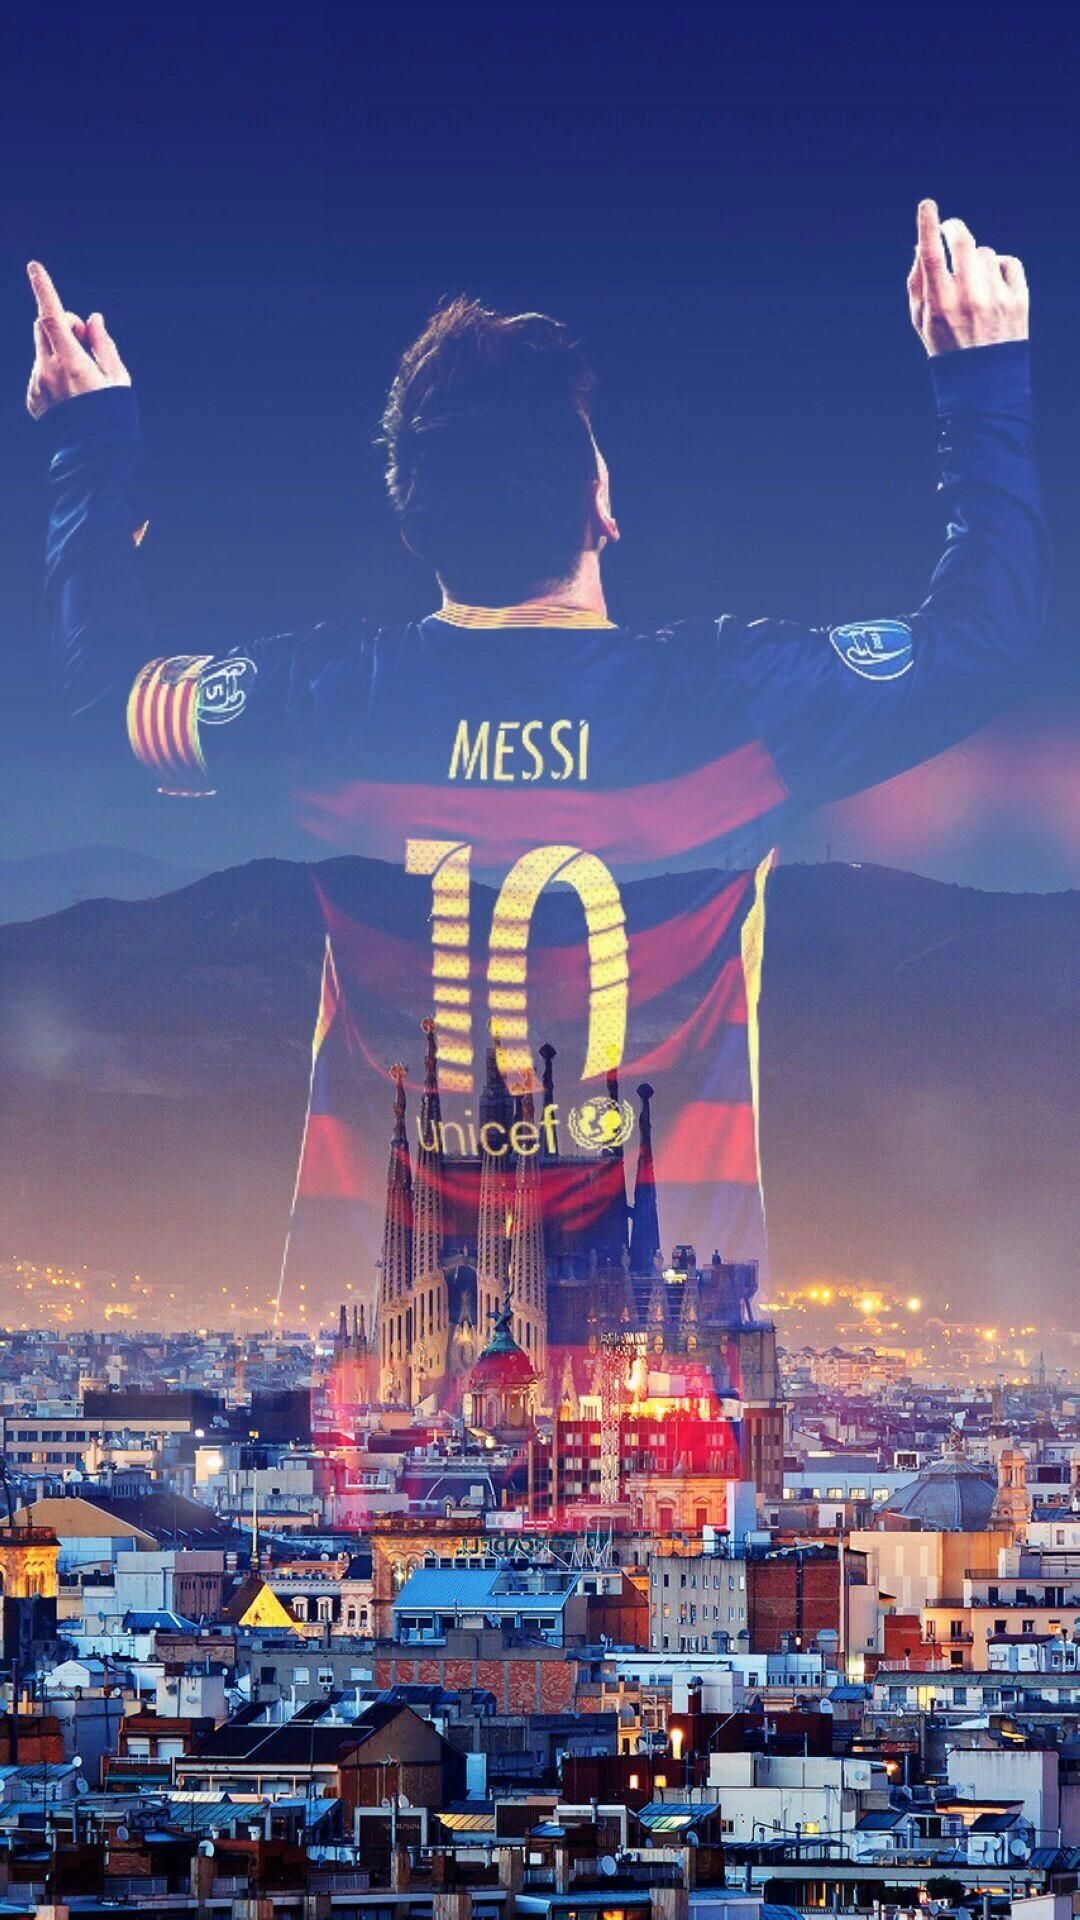 Messi-wallpaper-wpc9007557